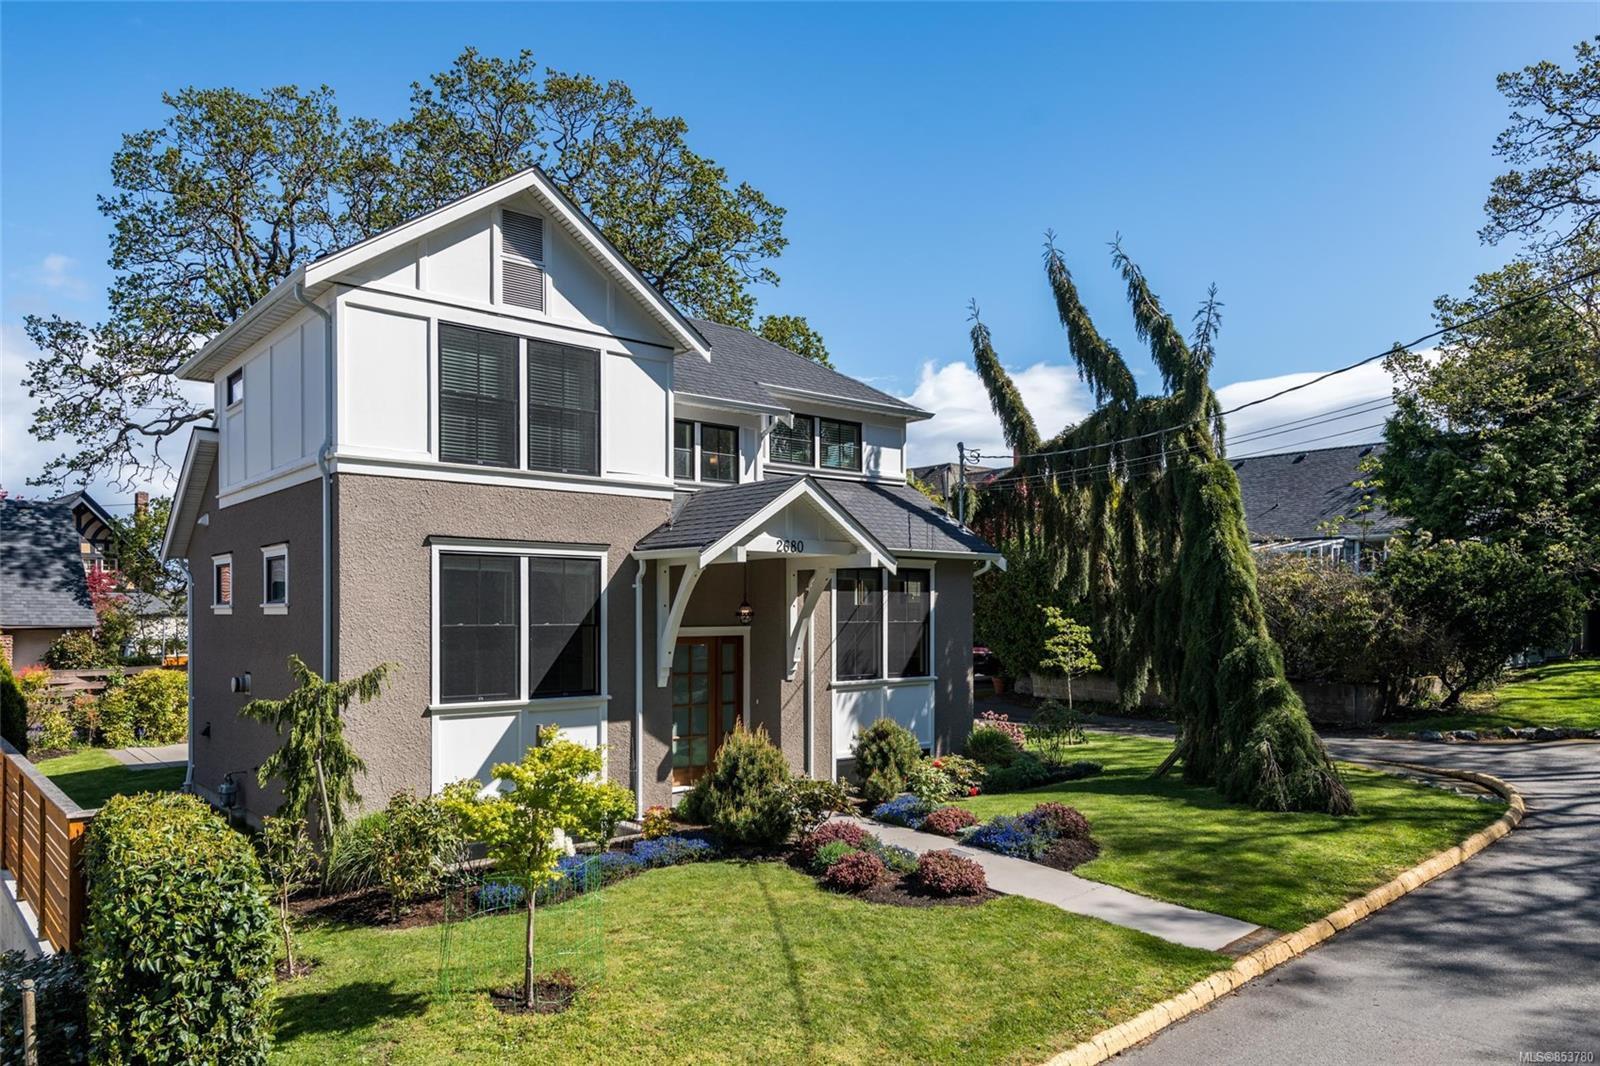 Main Photo: 2680 Margate Ave in : OB South Oak Bay Single Family Detached for sale (Oak Bay)  : MLS®# 853780